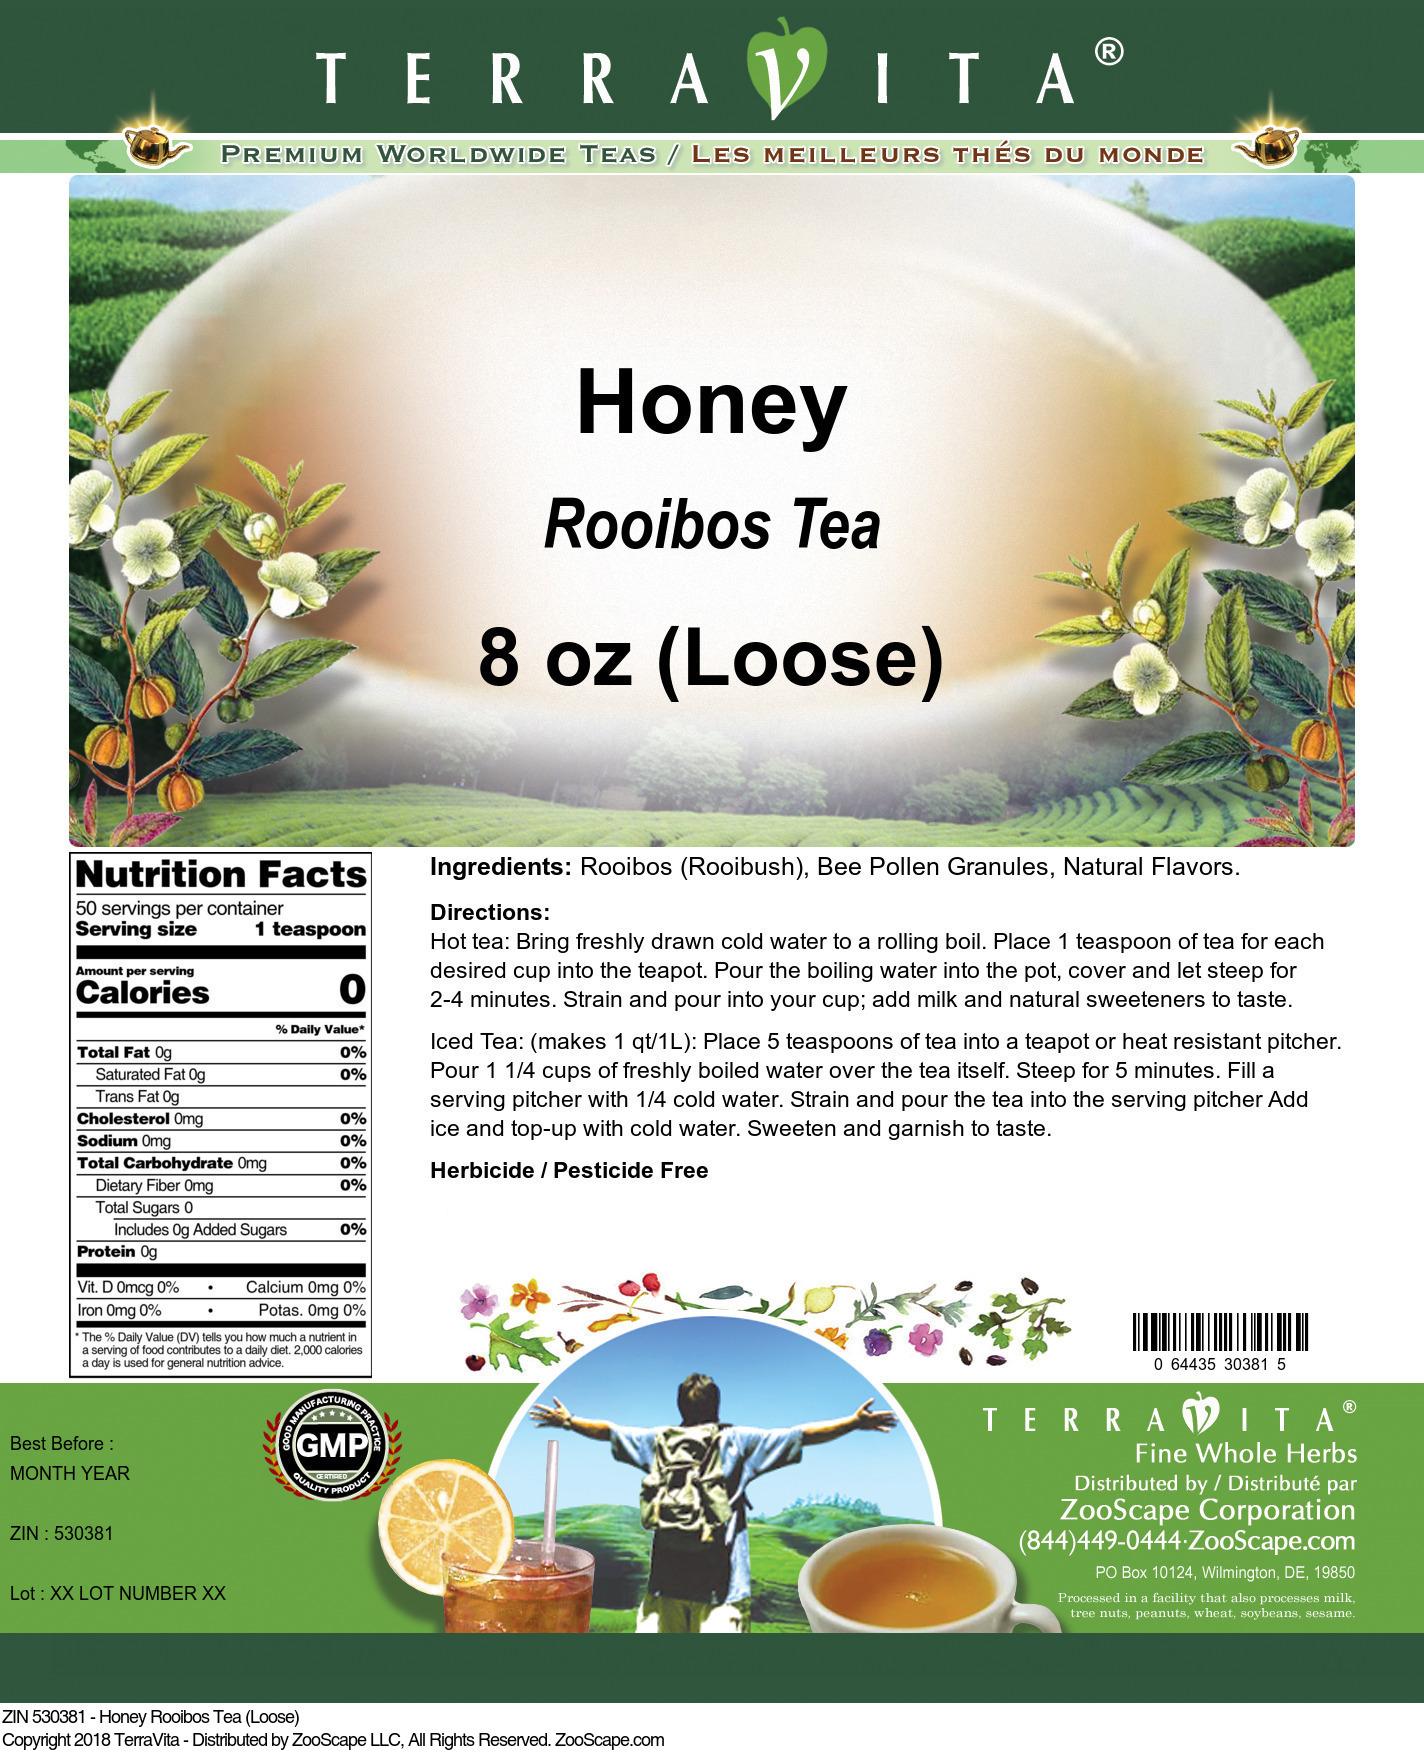 Honey Rooibos Tea (Loose)